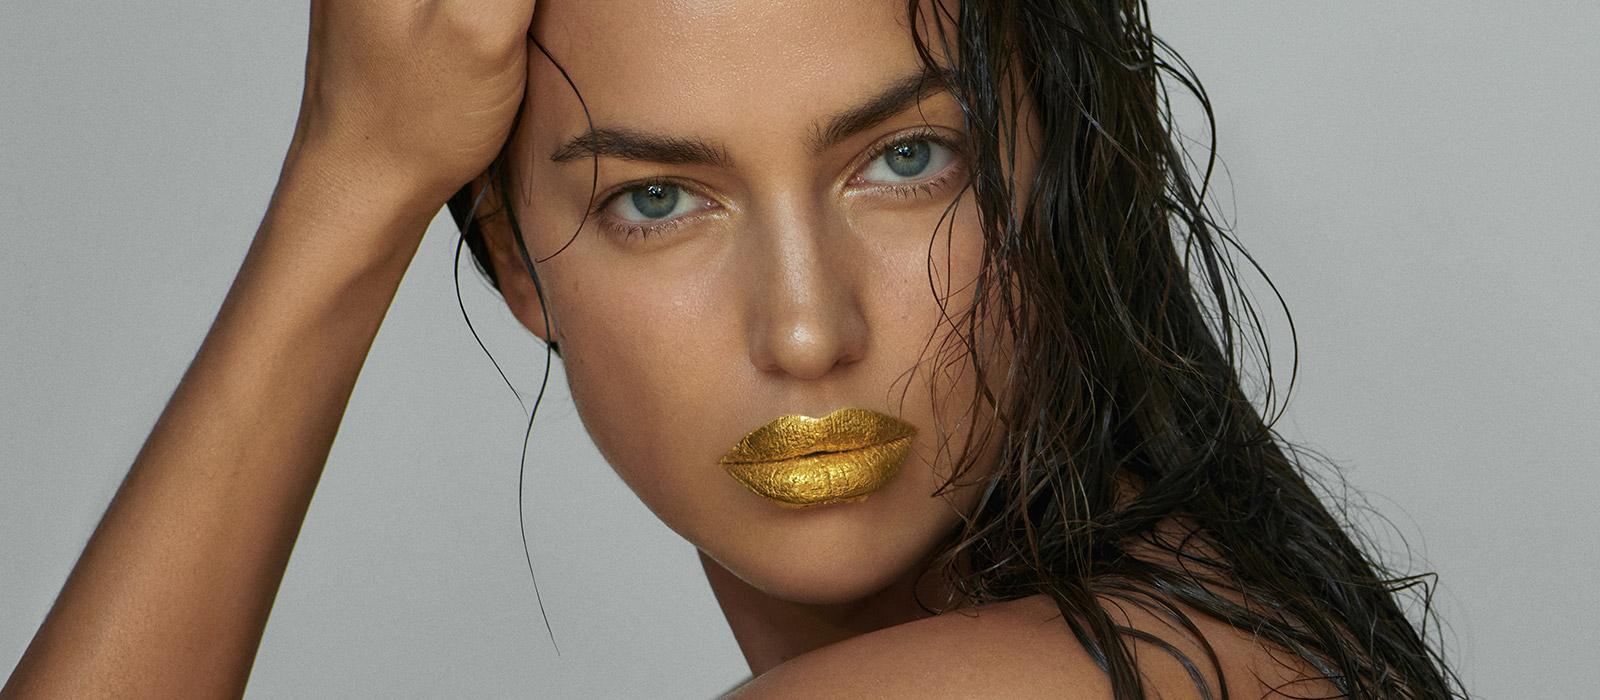 irina-shayk-x-mimi-luzon-fashionography-main